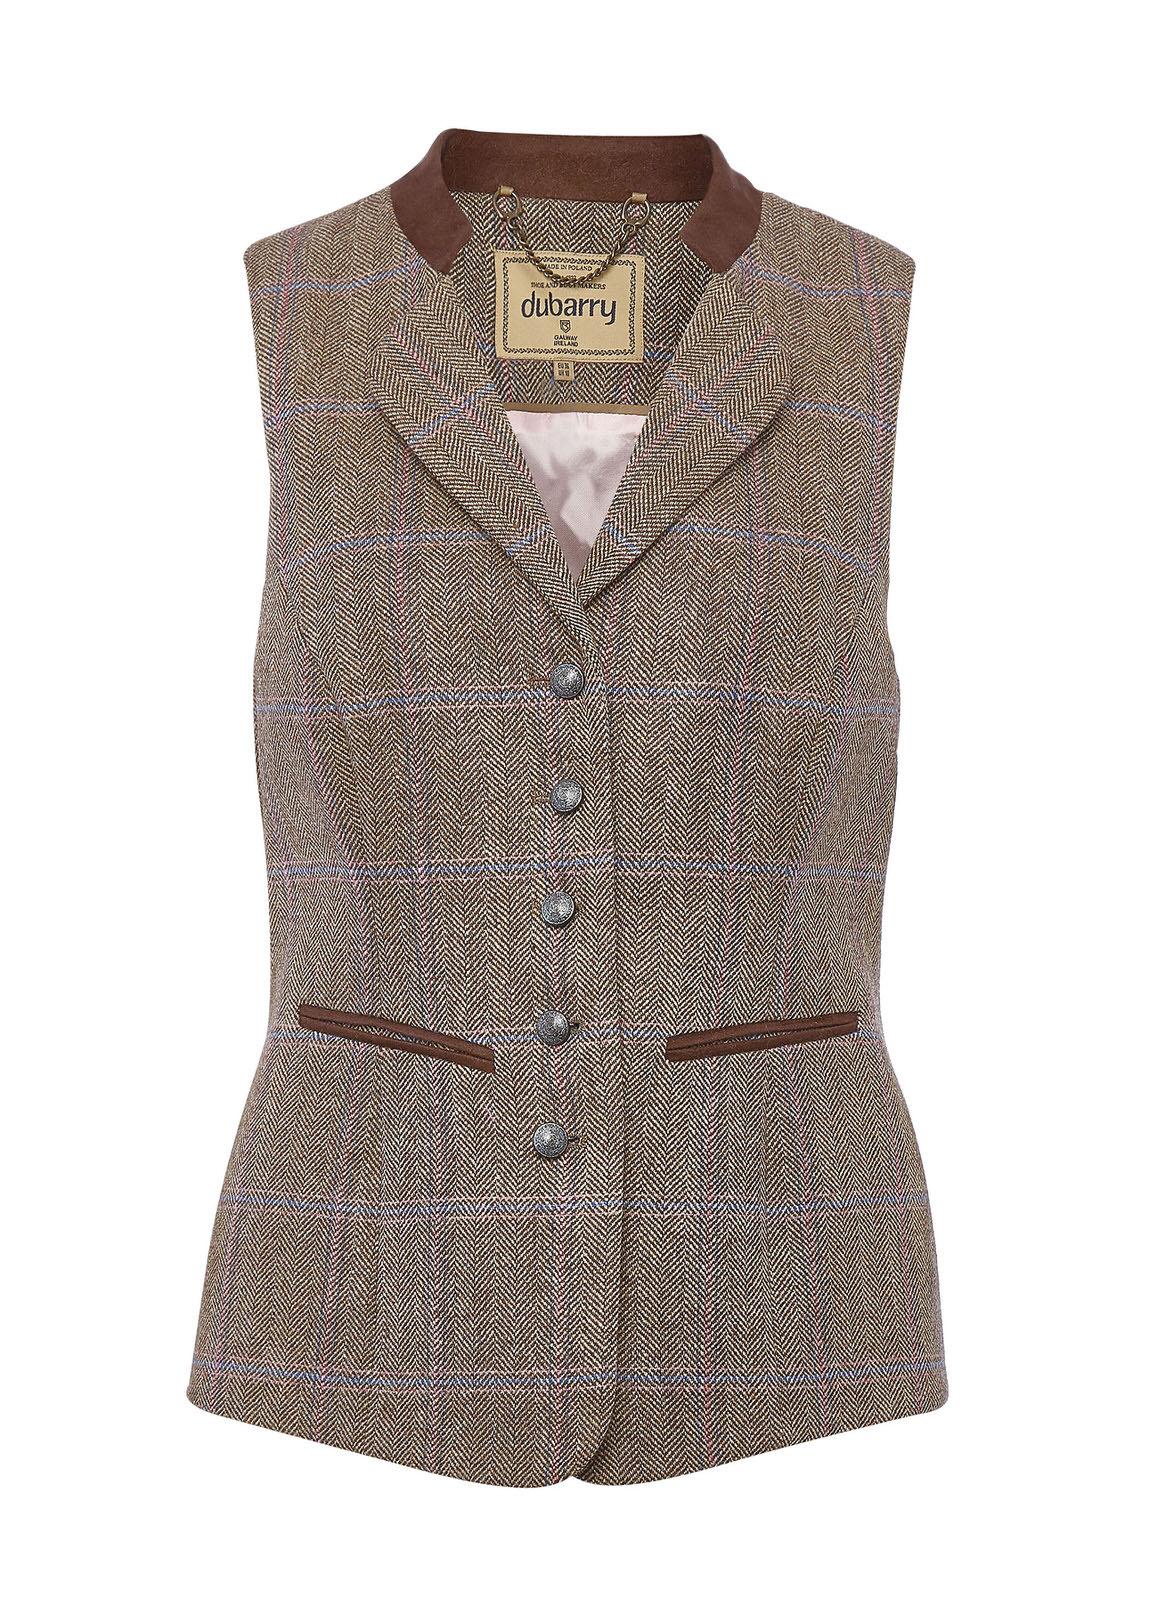 Spindle_Tweed_Waistcoat_Woodrose_Image_1